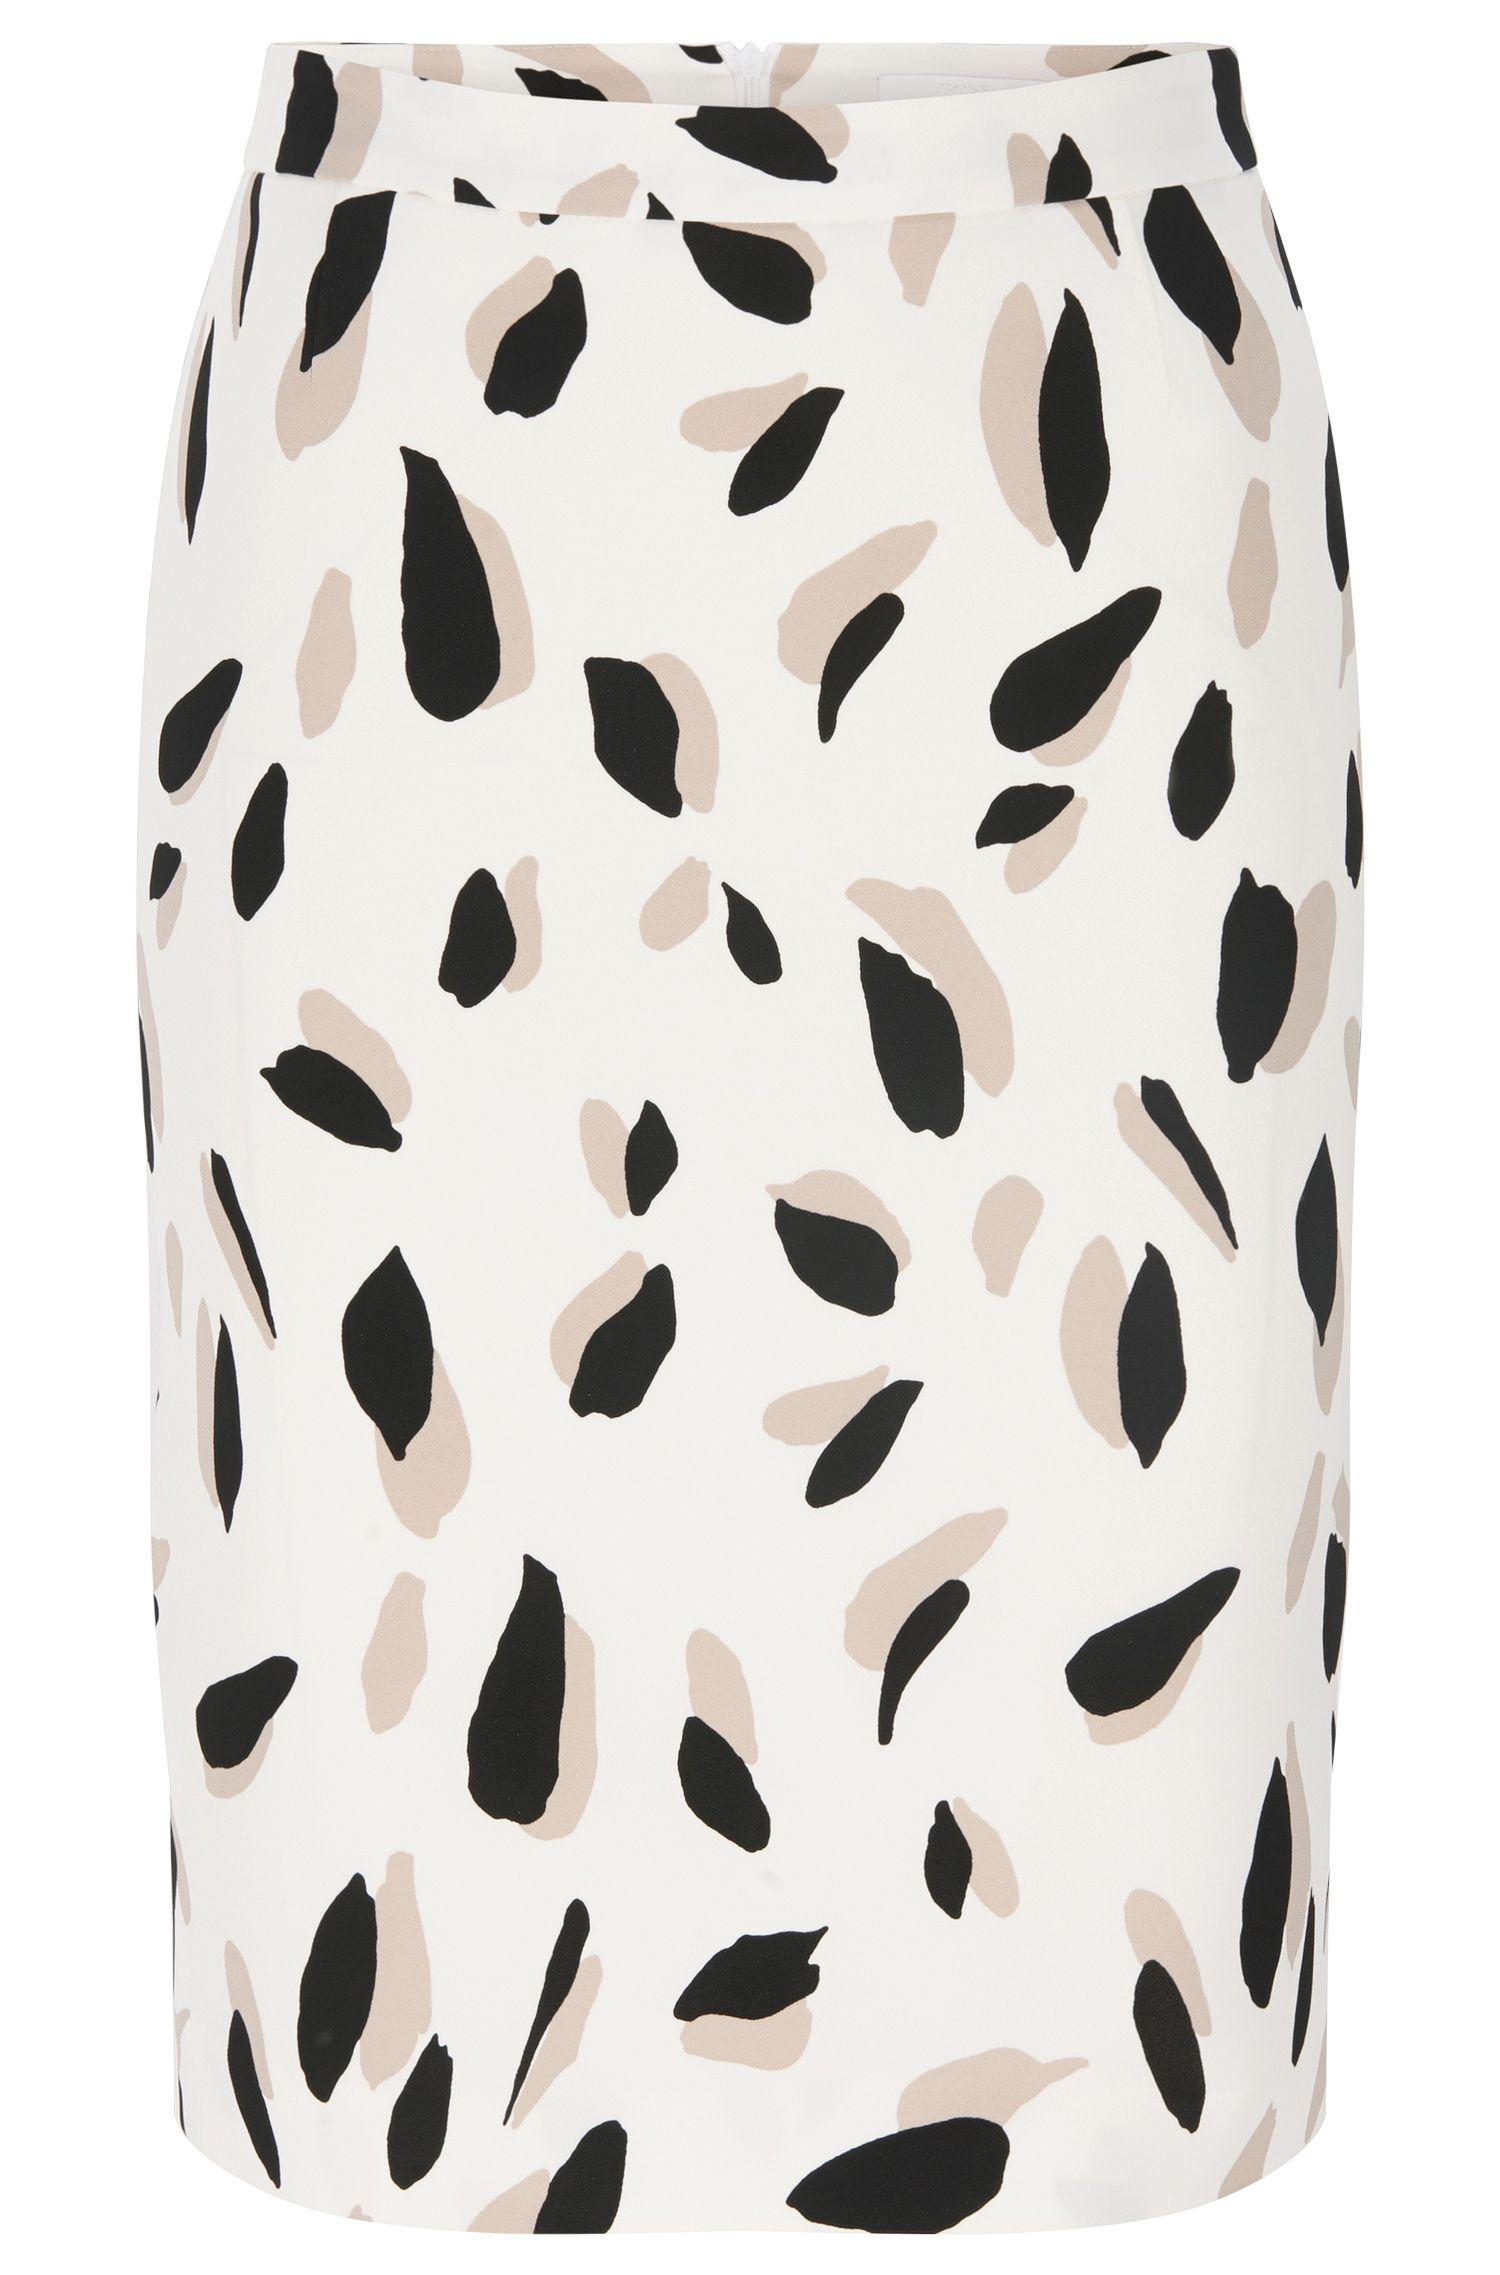 'Vimena' | Stretch Viscose Printed Pencil Skirt